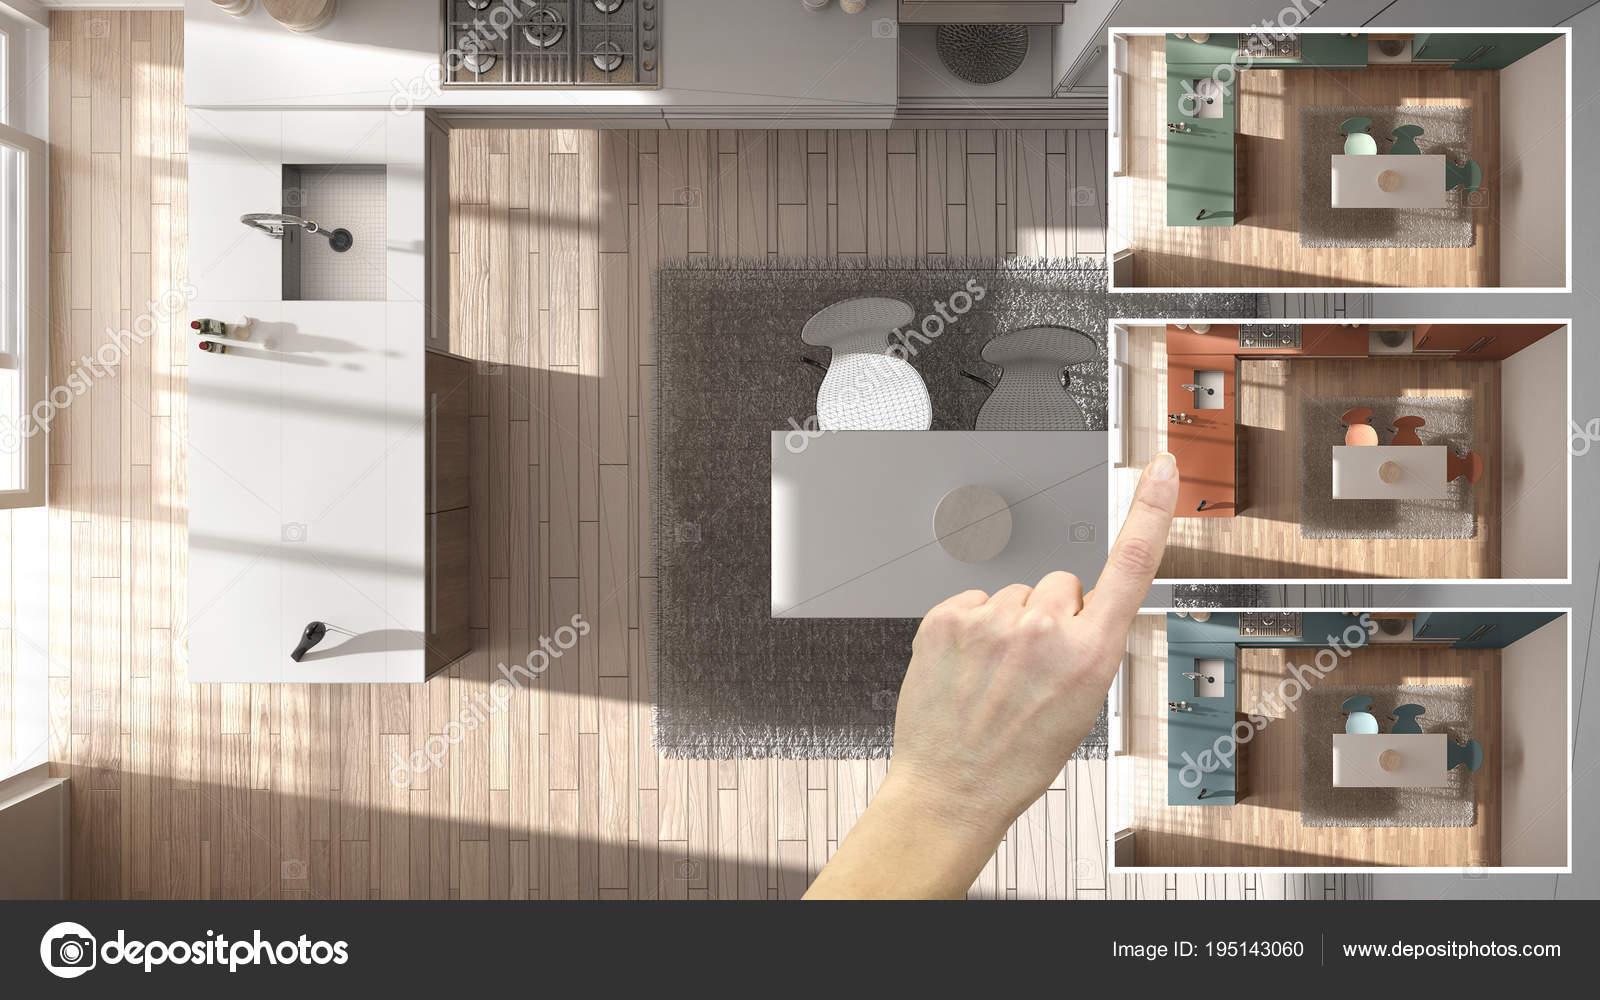 kitchen samples ikea rug 建筑师设计师概念 手展示厨房颜色不同的选择 室内设计项目草稿 拾色器 材料样品 照片作者archiviz